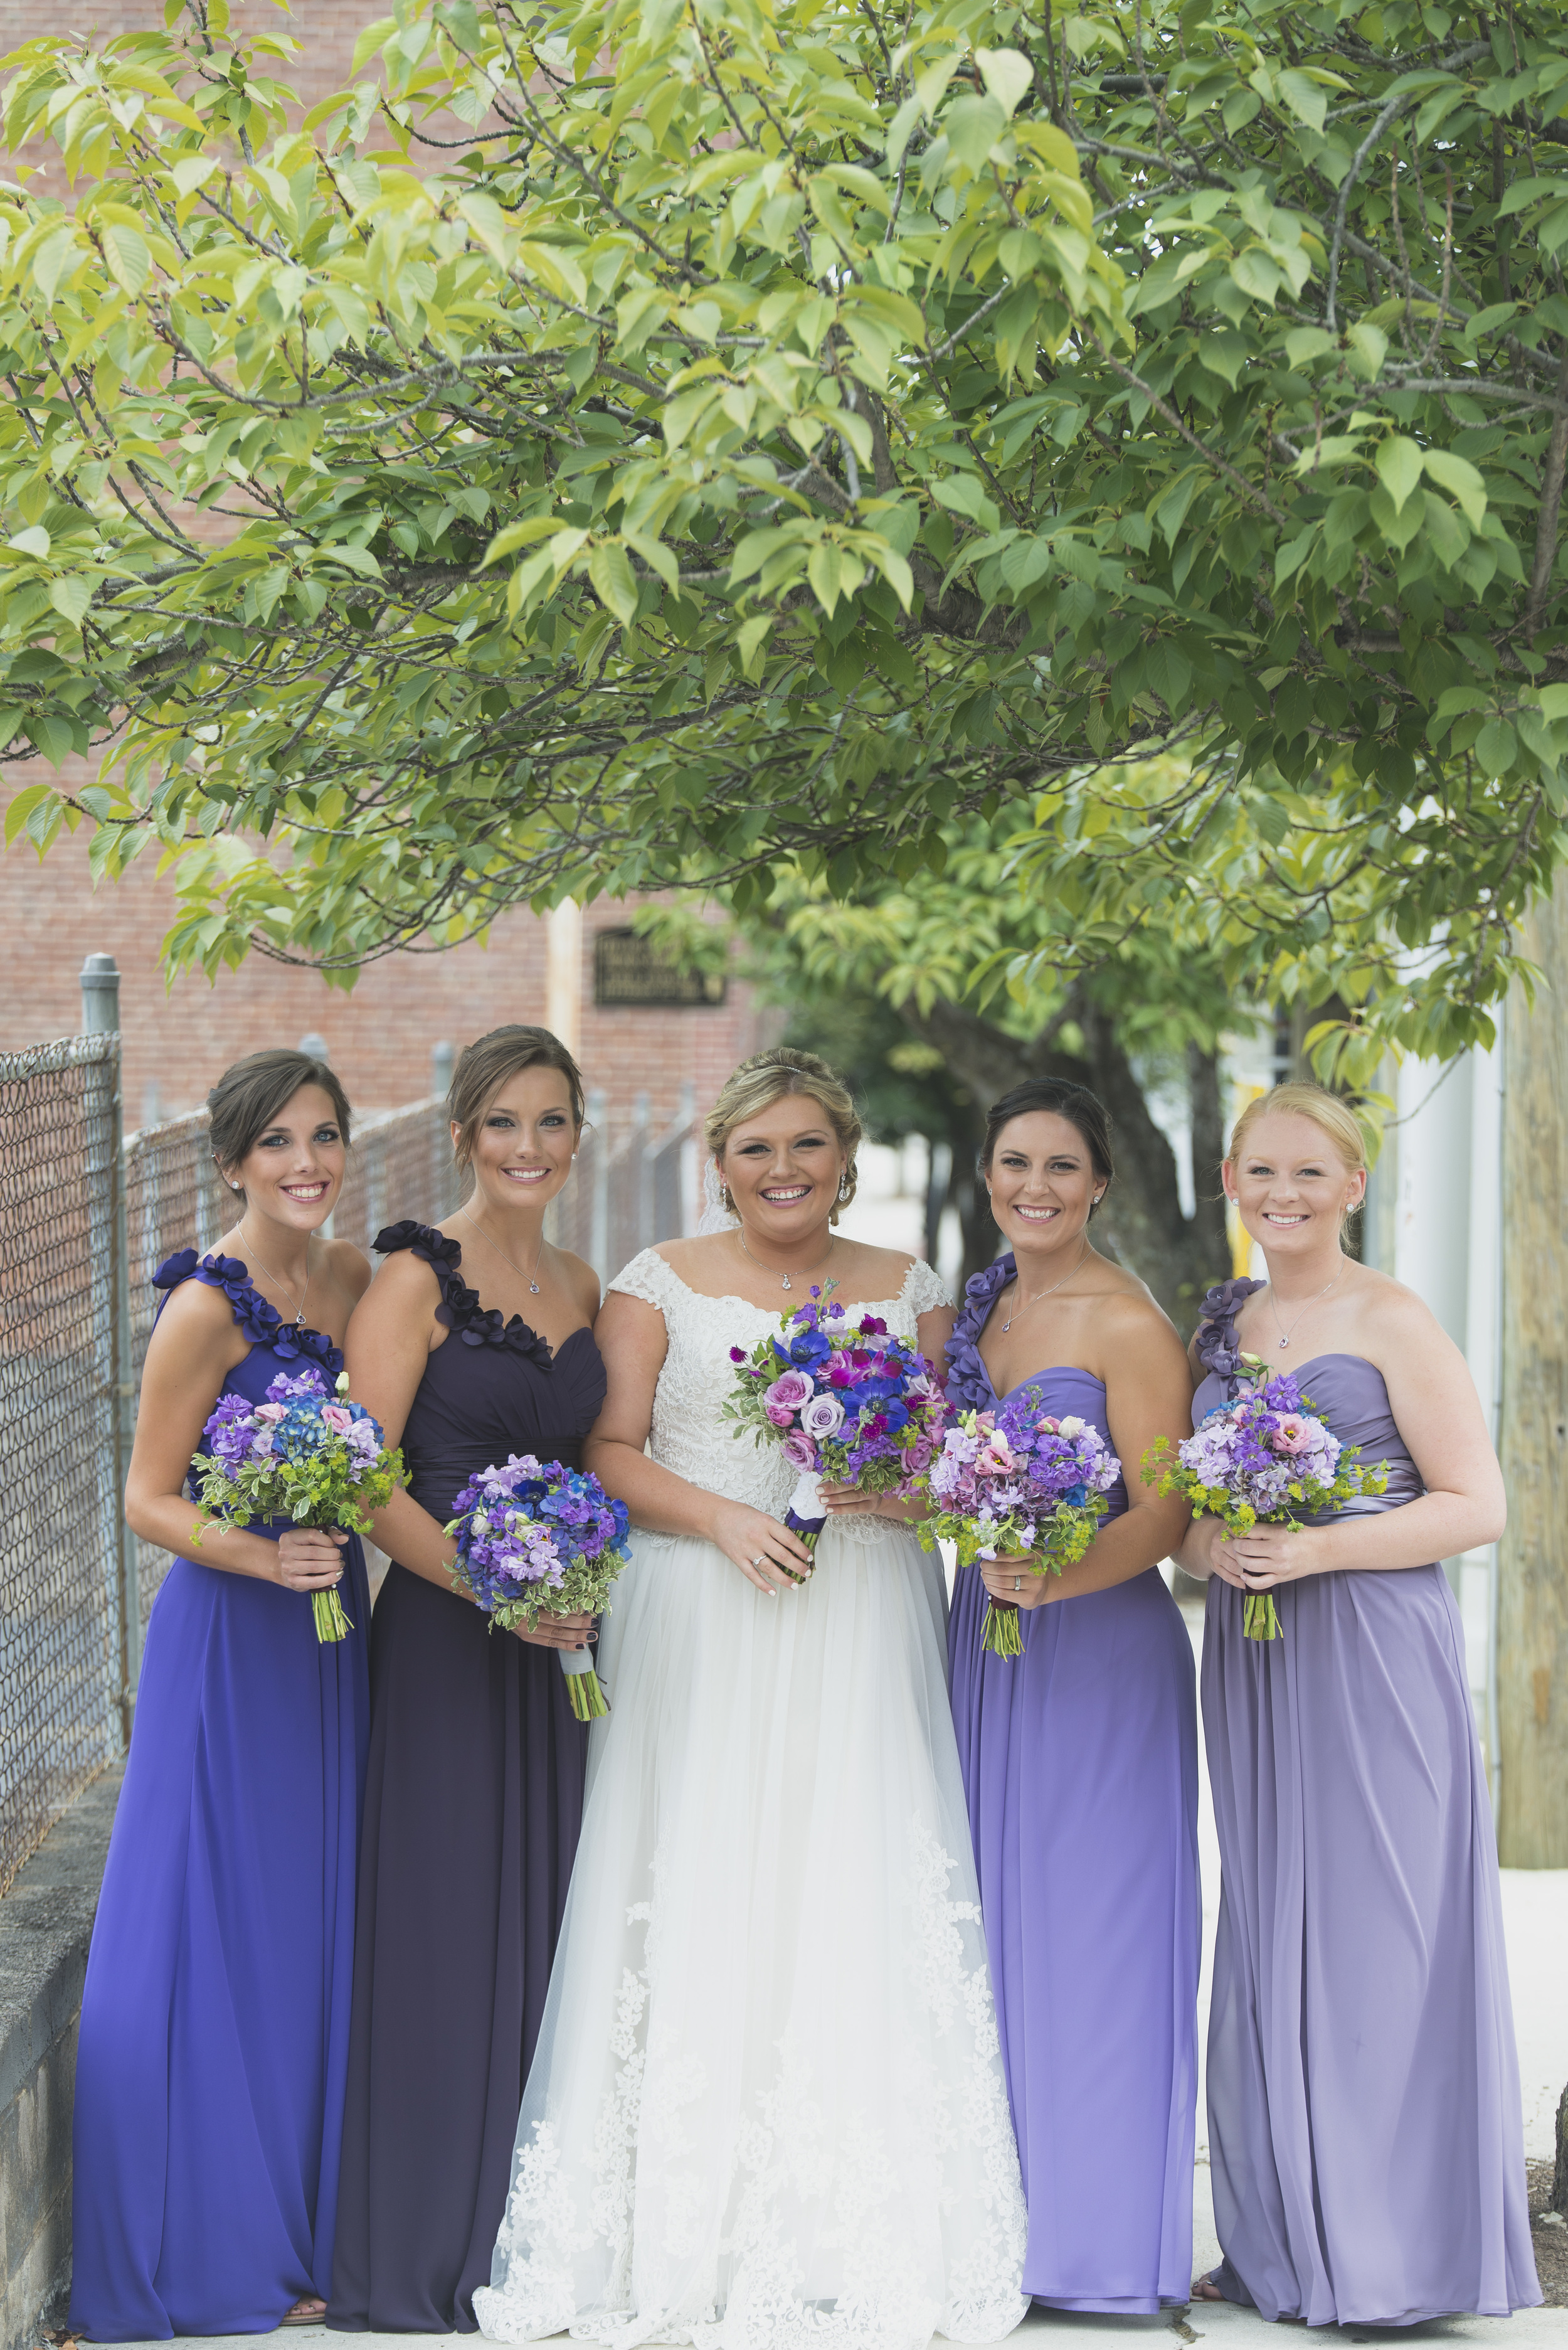 Lynchburg_VA_Wedding_Tresca on 8th_Downtown_Purple_elegant_Photos867.jpg